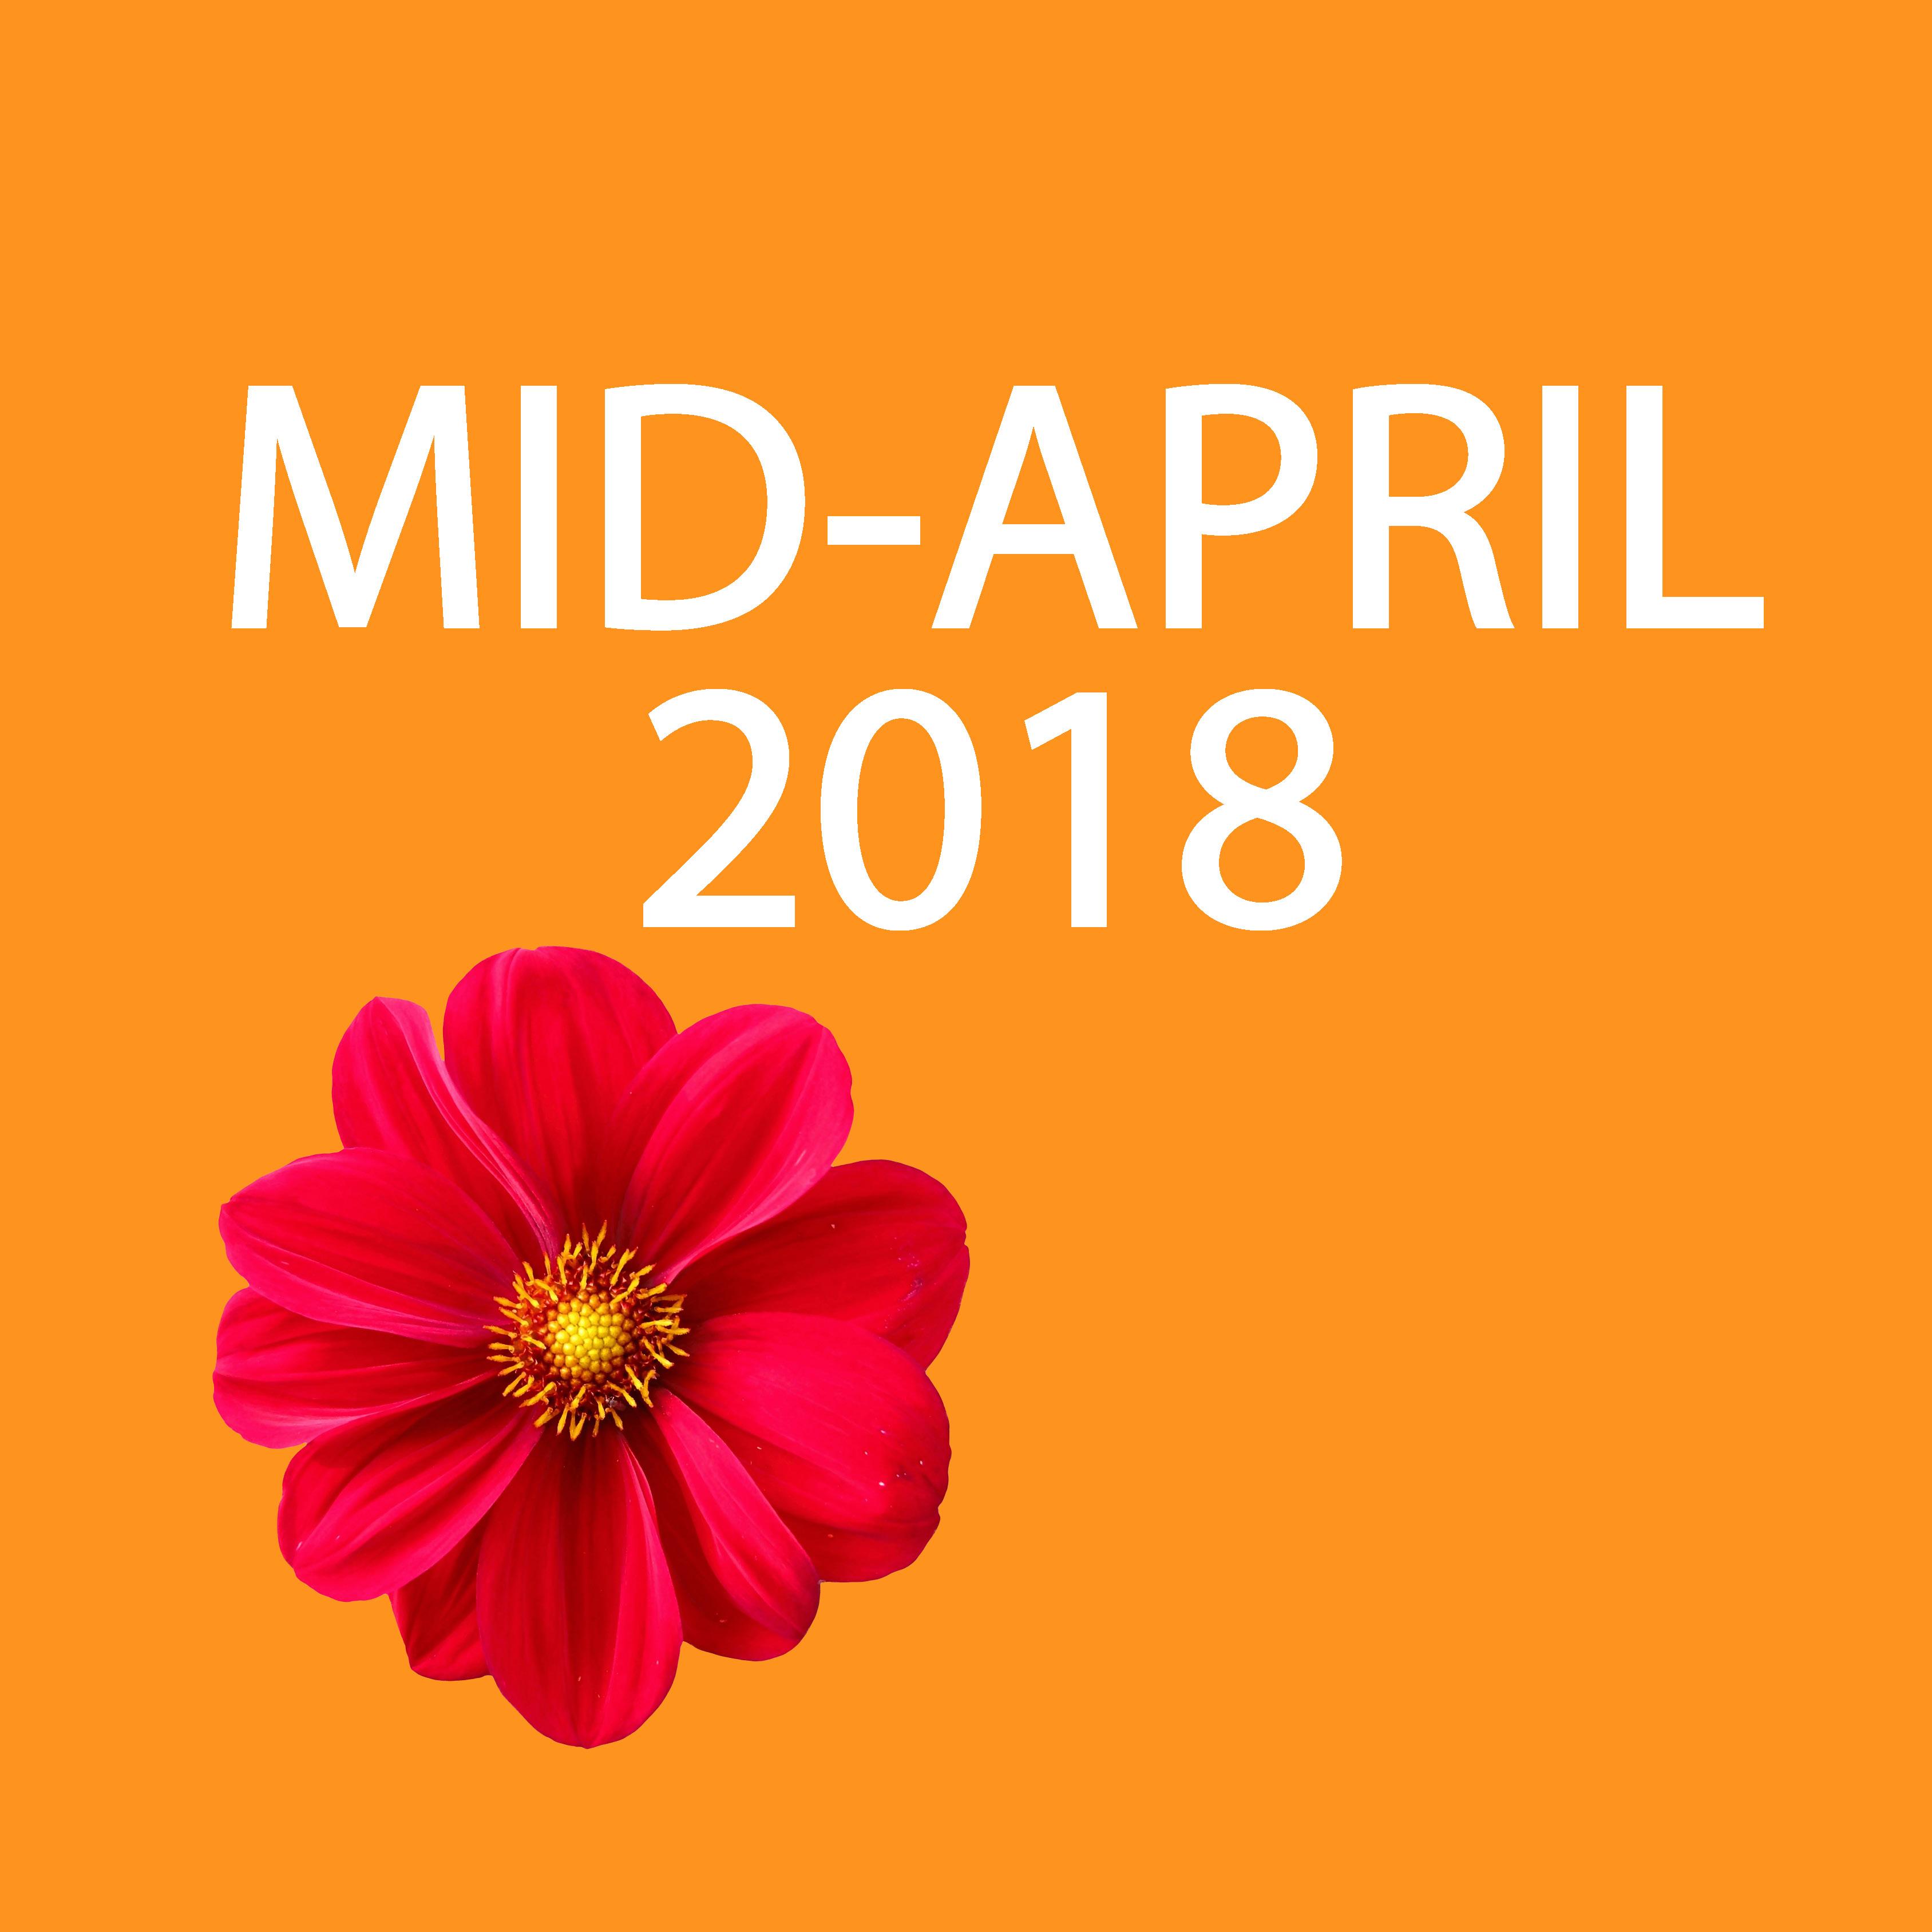 MidApril18